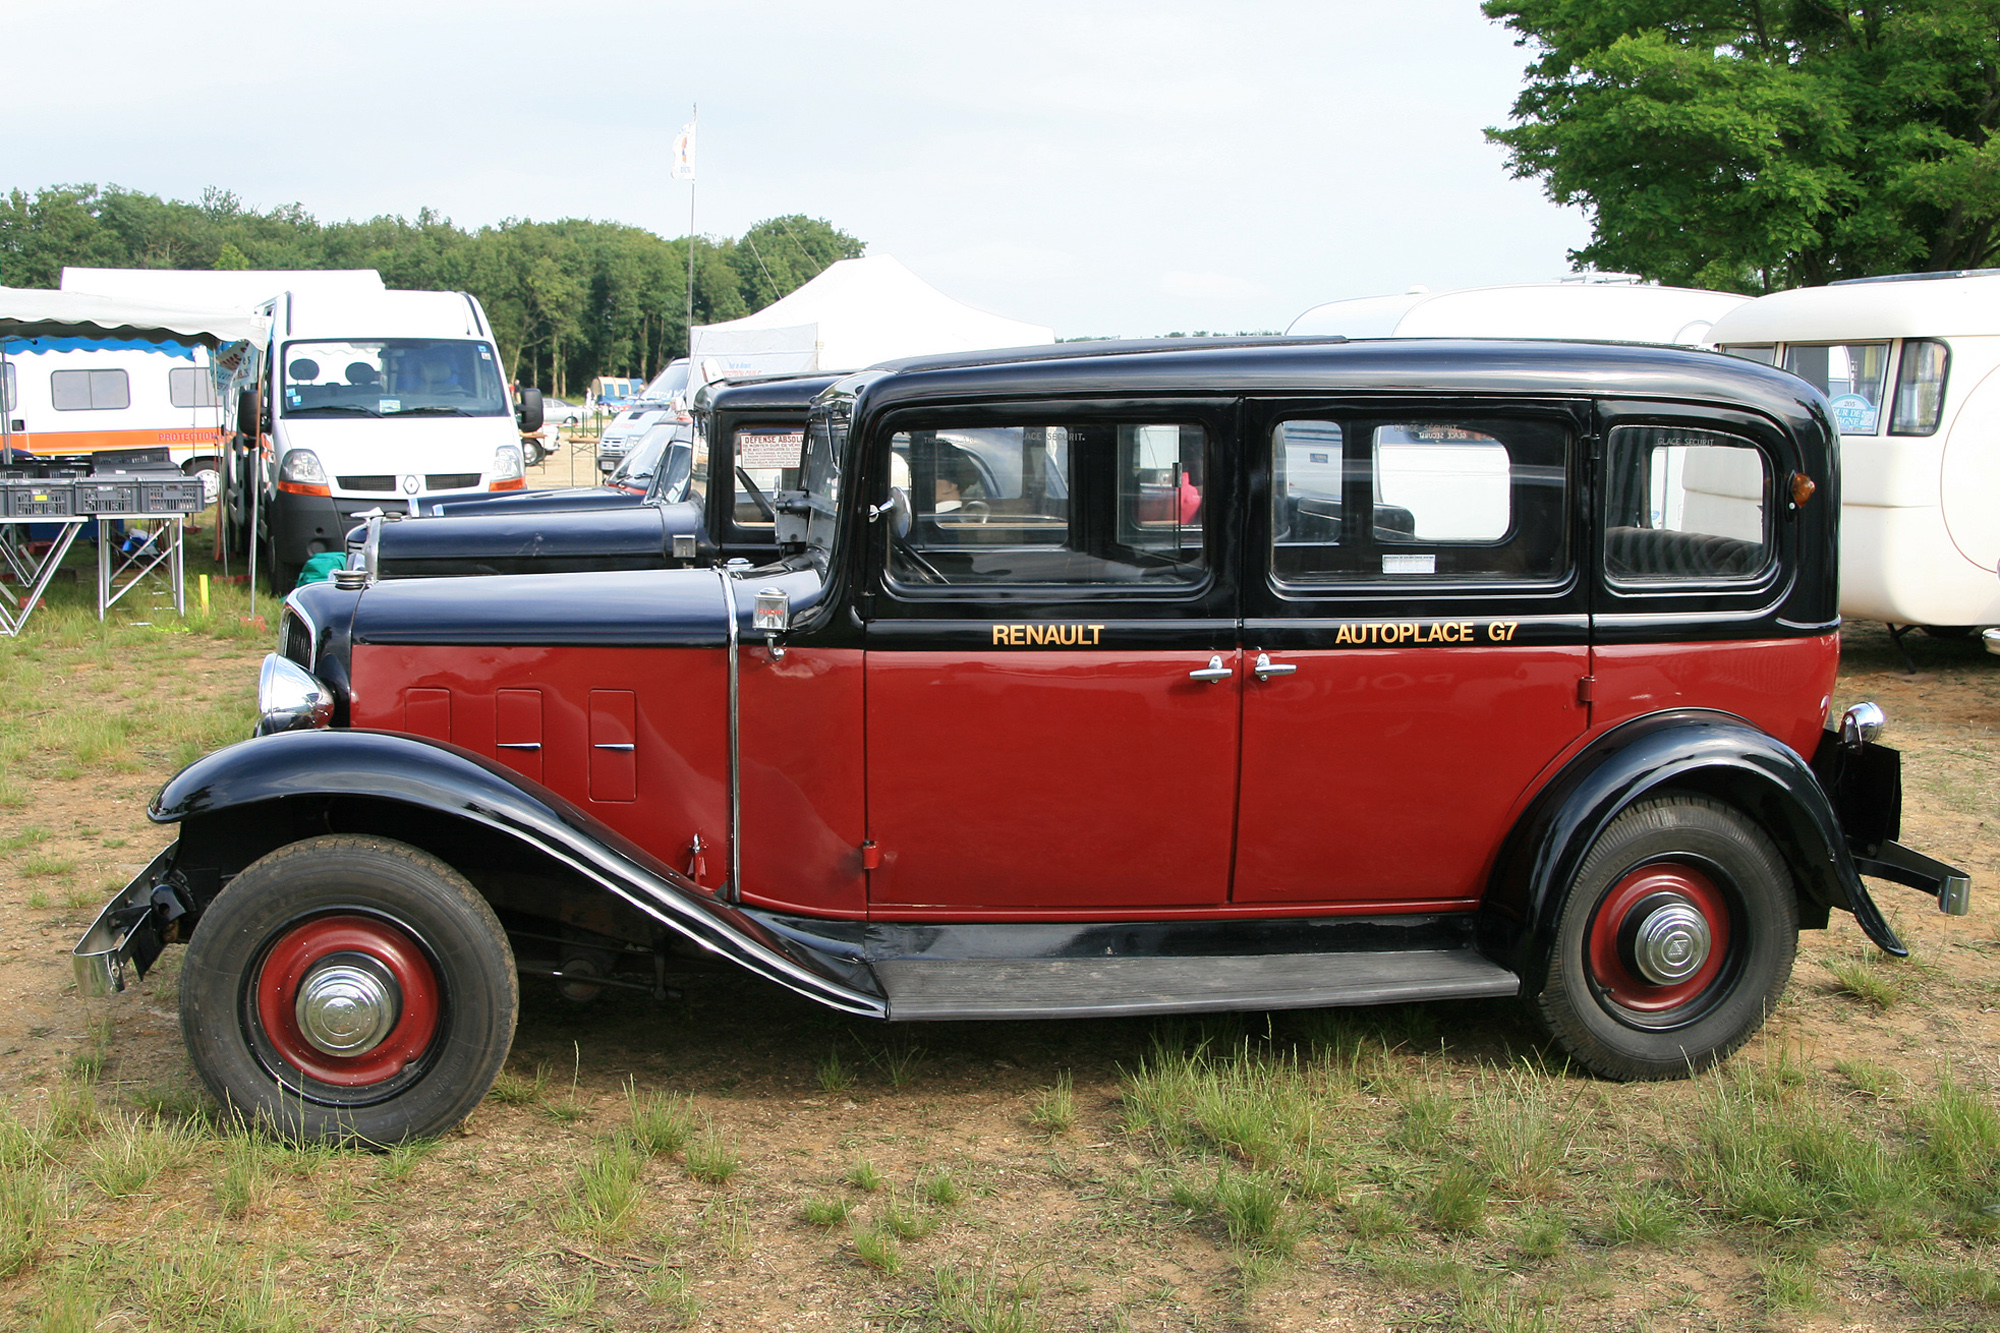 description du v hicule renault taxi g7 kz11 encyclop die automobile. Black Bedroom Furniture Sets. Home Design Ideas